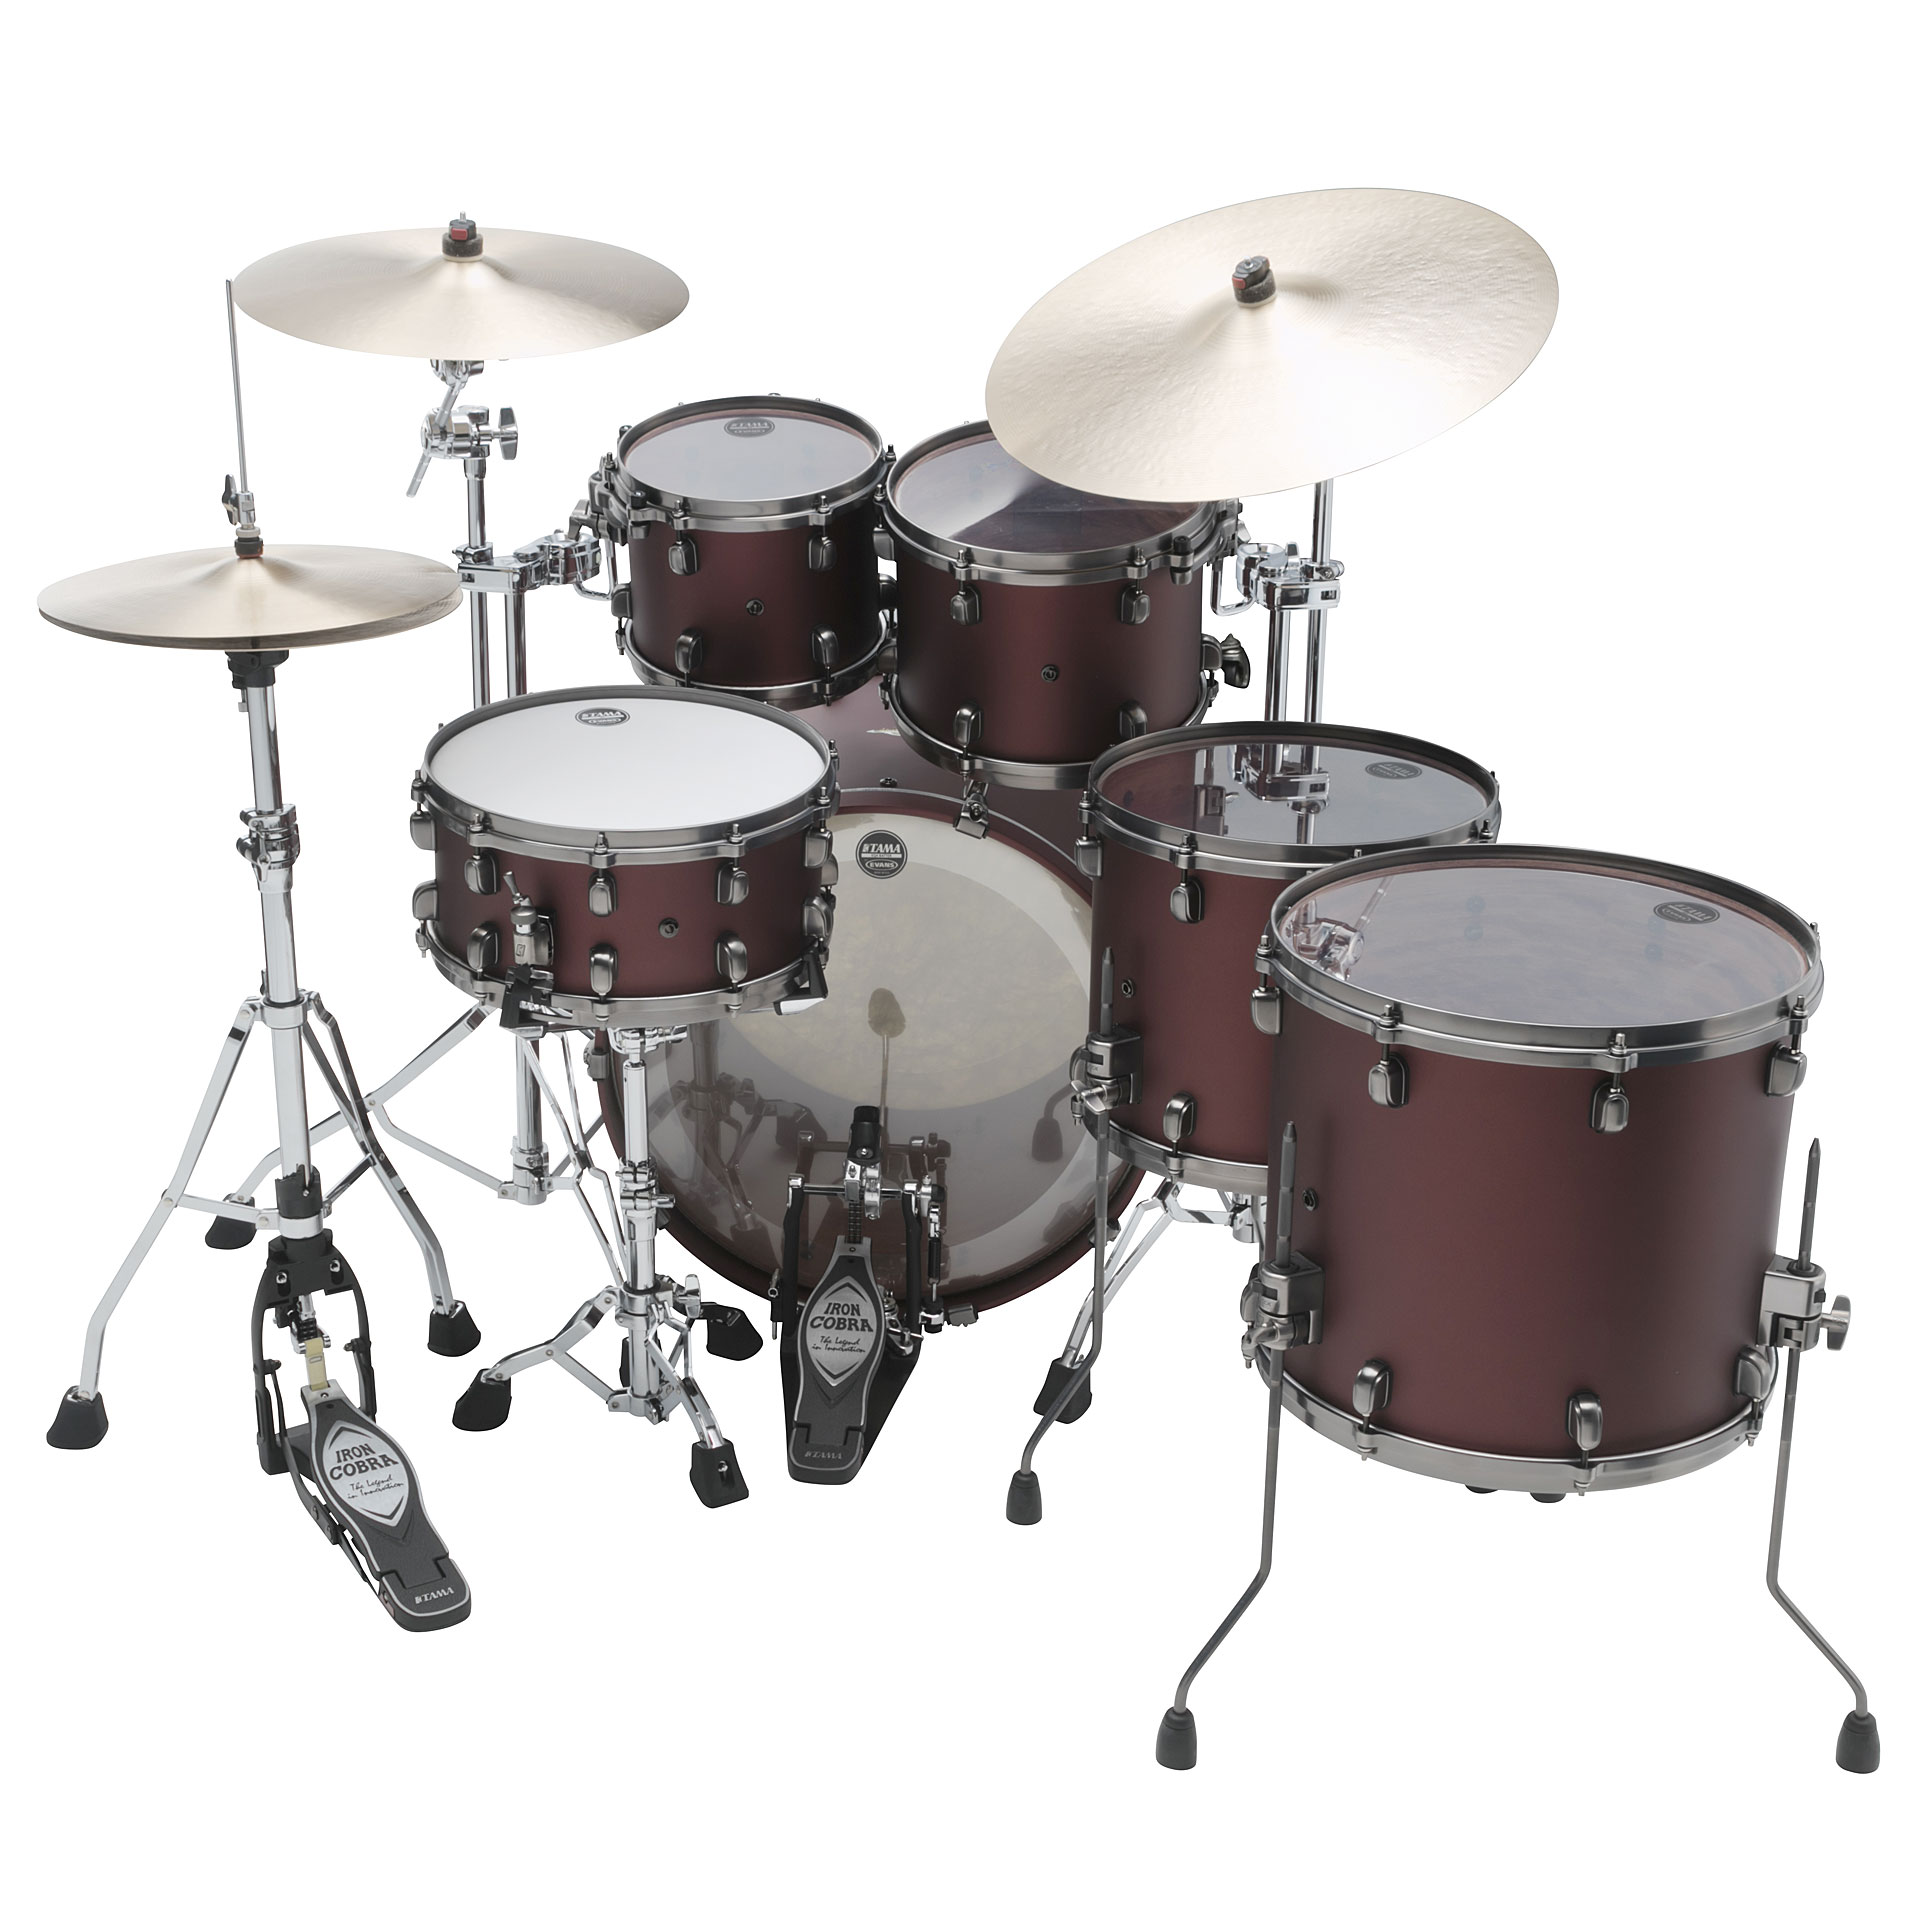 Tama starclassic bubinga 22 flat burgundy metallic drum kit for Classic house drums